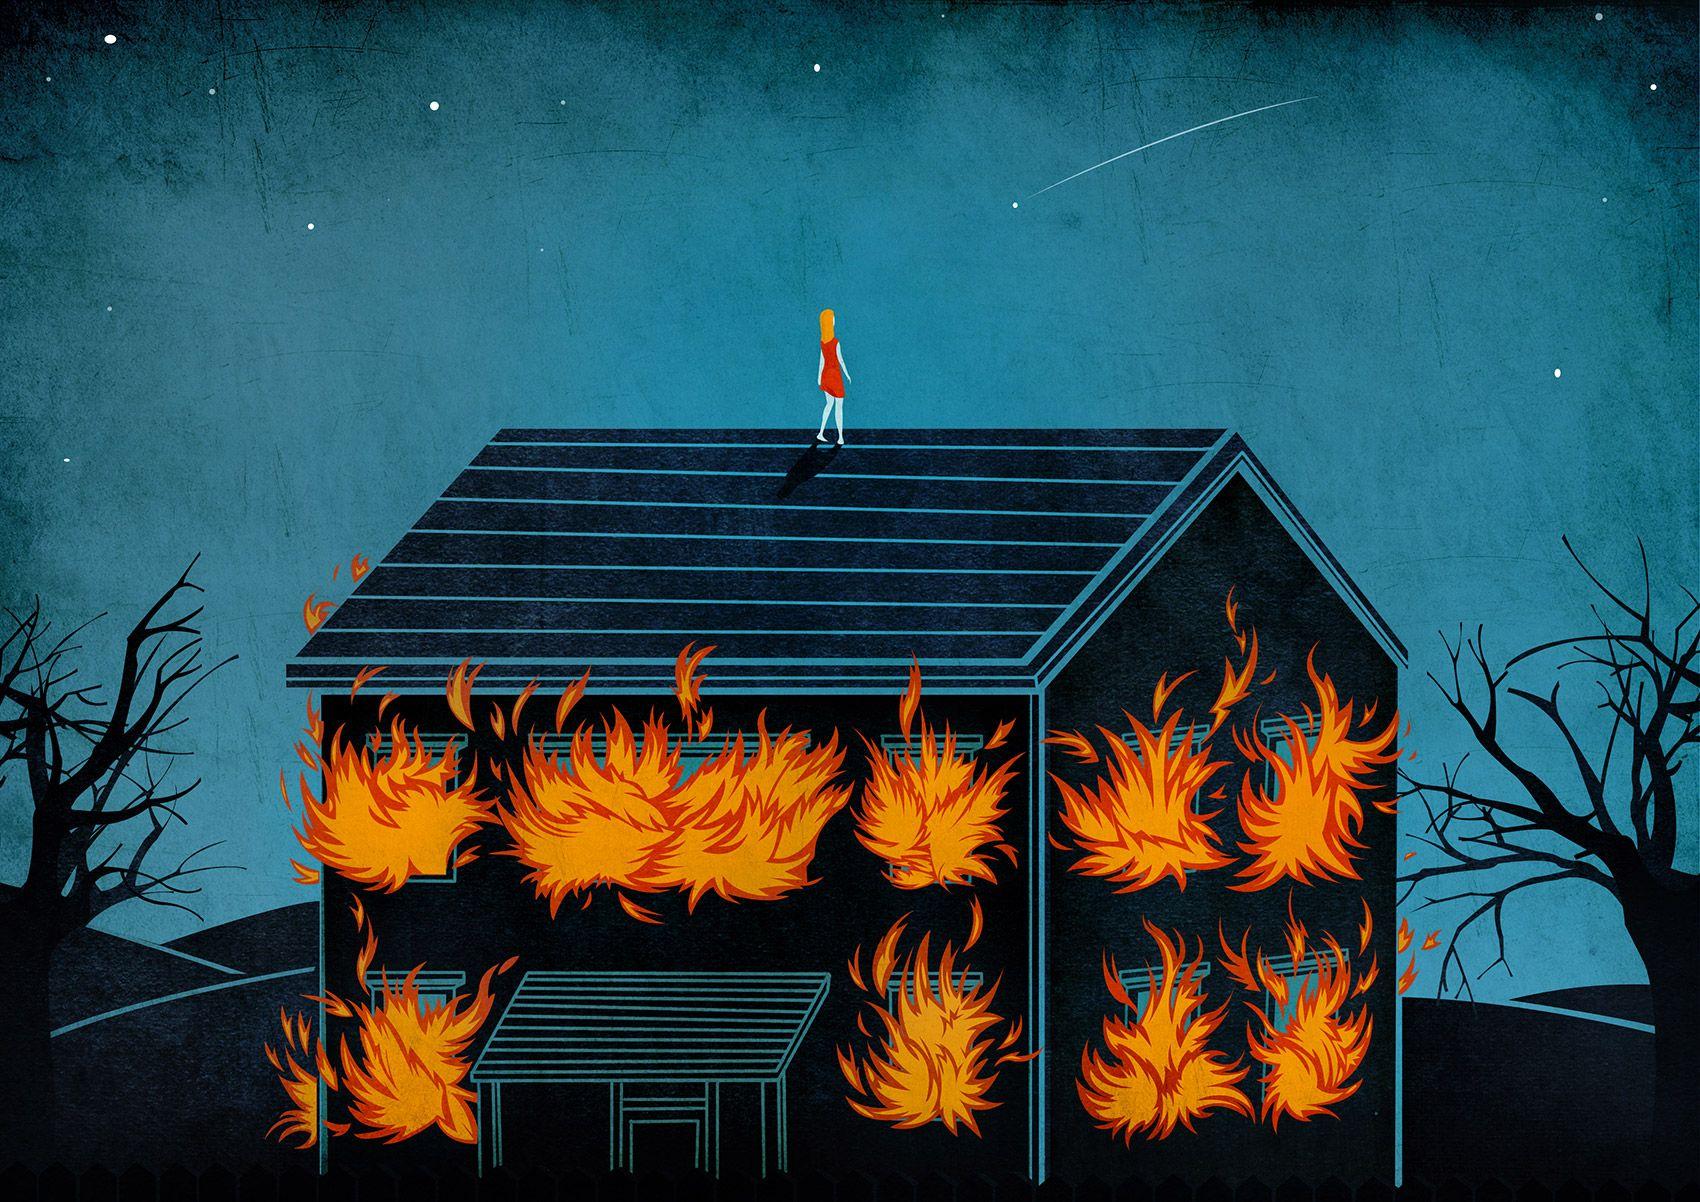 Burning down the house © Benedetto Cristofani, all right reserved  #illustration #editorial #editorialillustration #conceptual #conceptualillustration #freedom #psychology #dream www.benedettocristofani.net